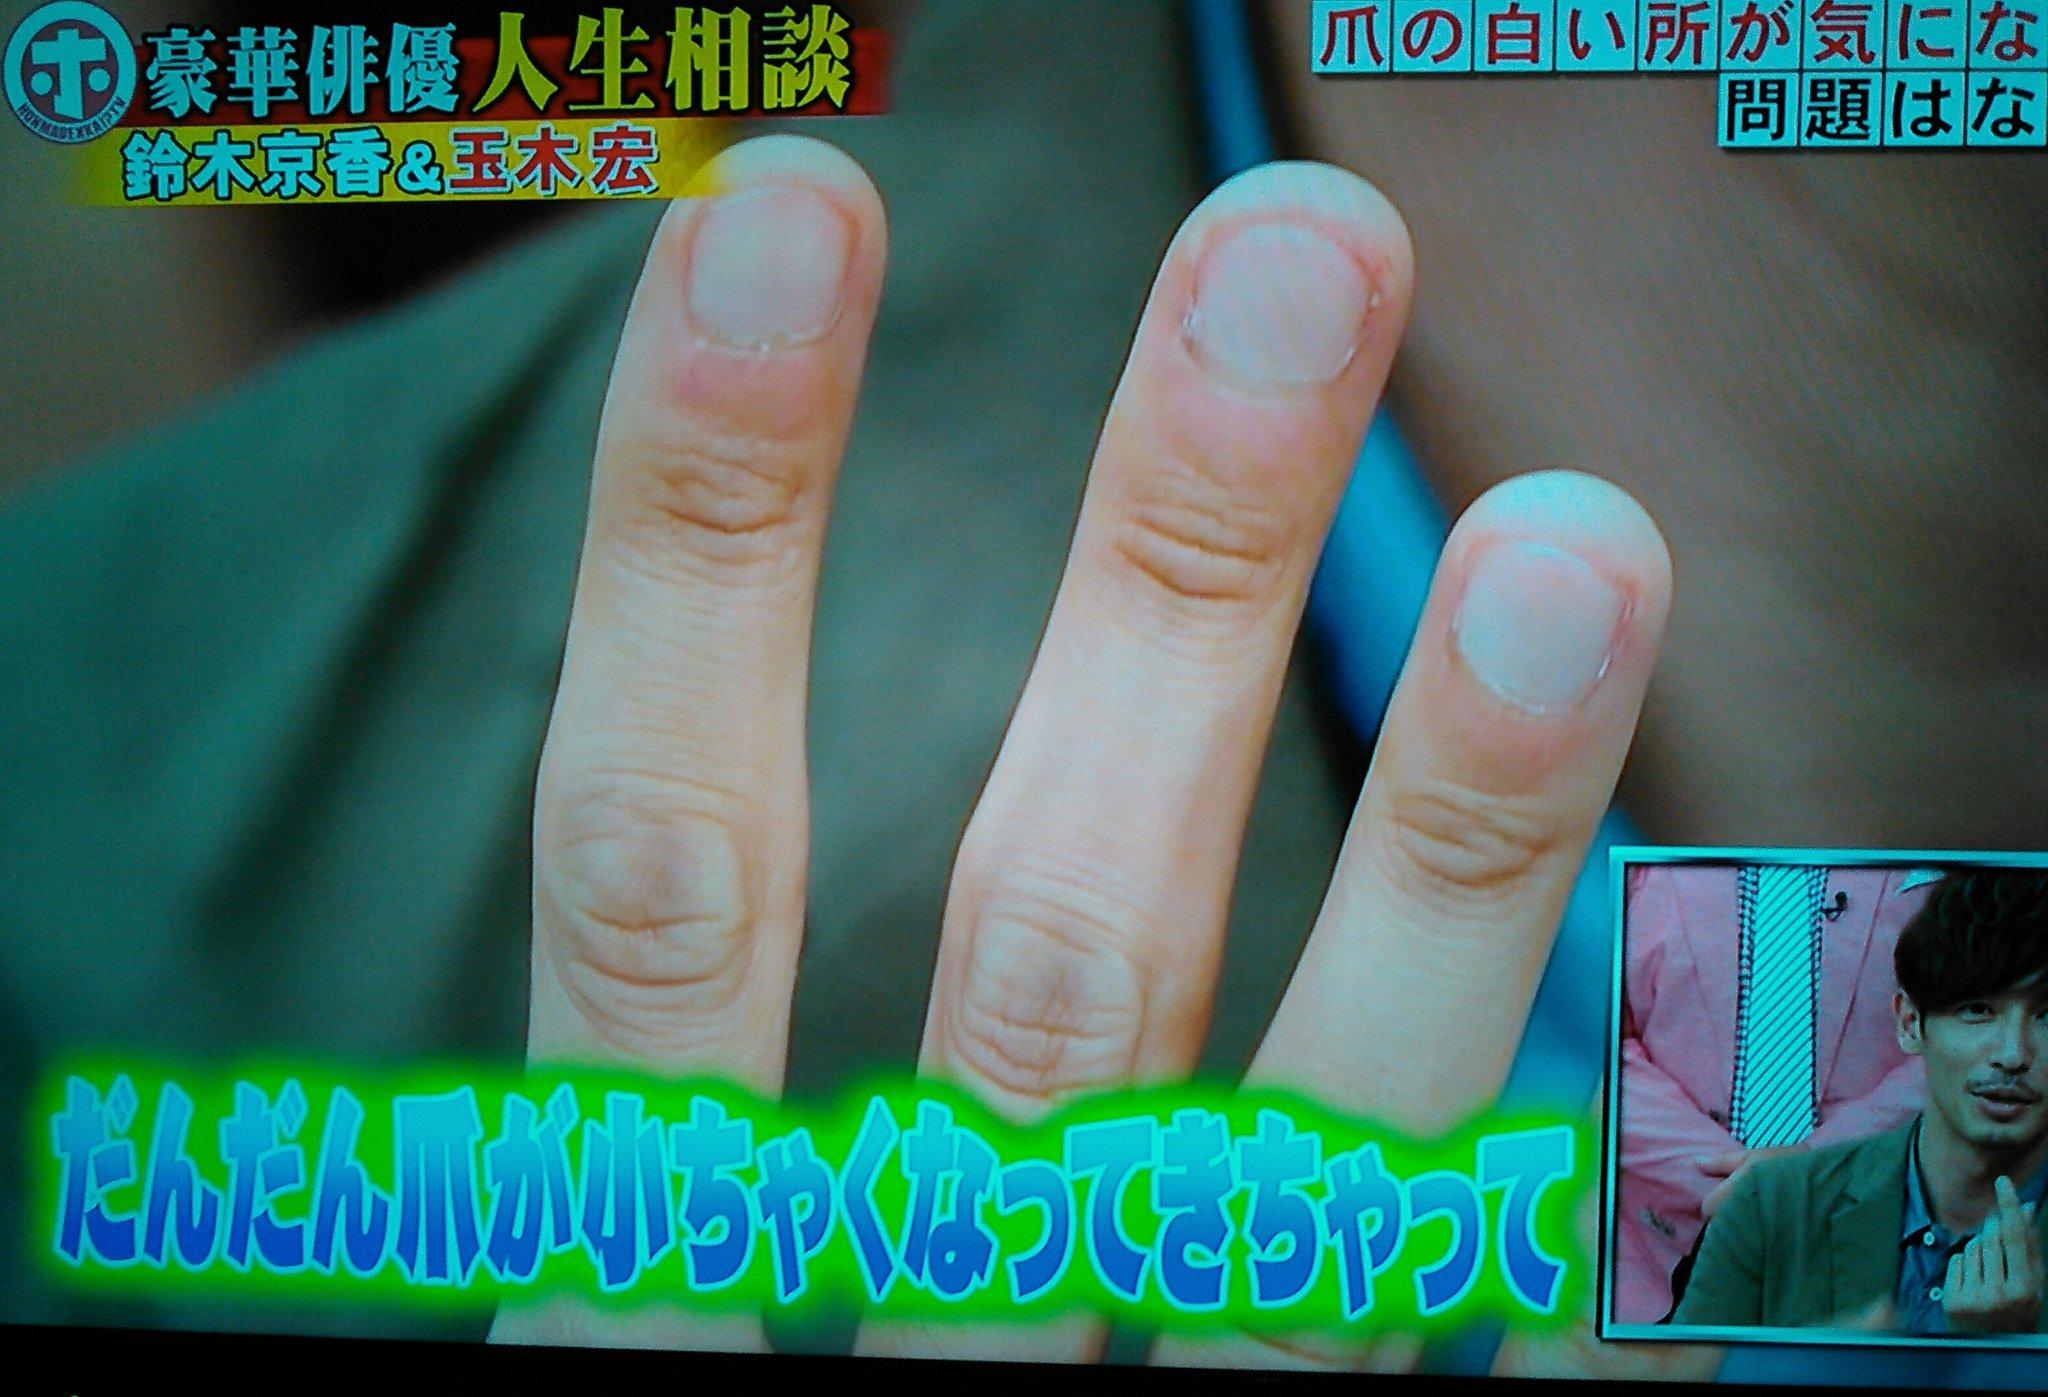 tamakihiroshi hurdle marry DKKy7gIUIAEaRrU - 玉木宏が恋人へ求める条件と、高すぎる結婚へのハードル